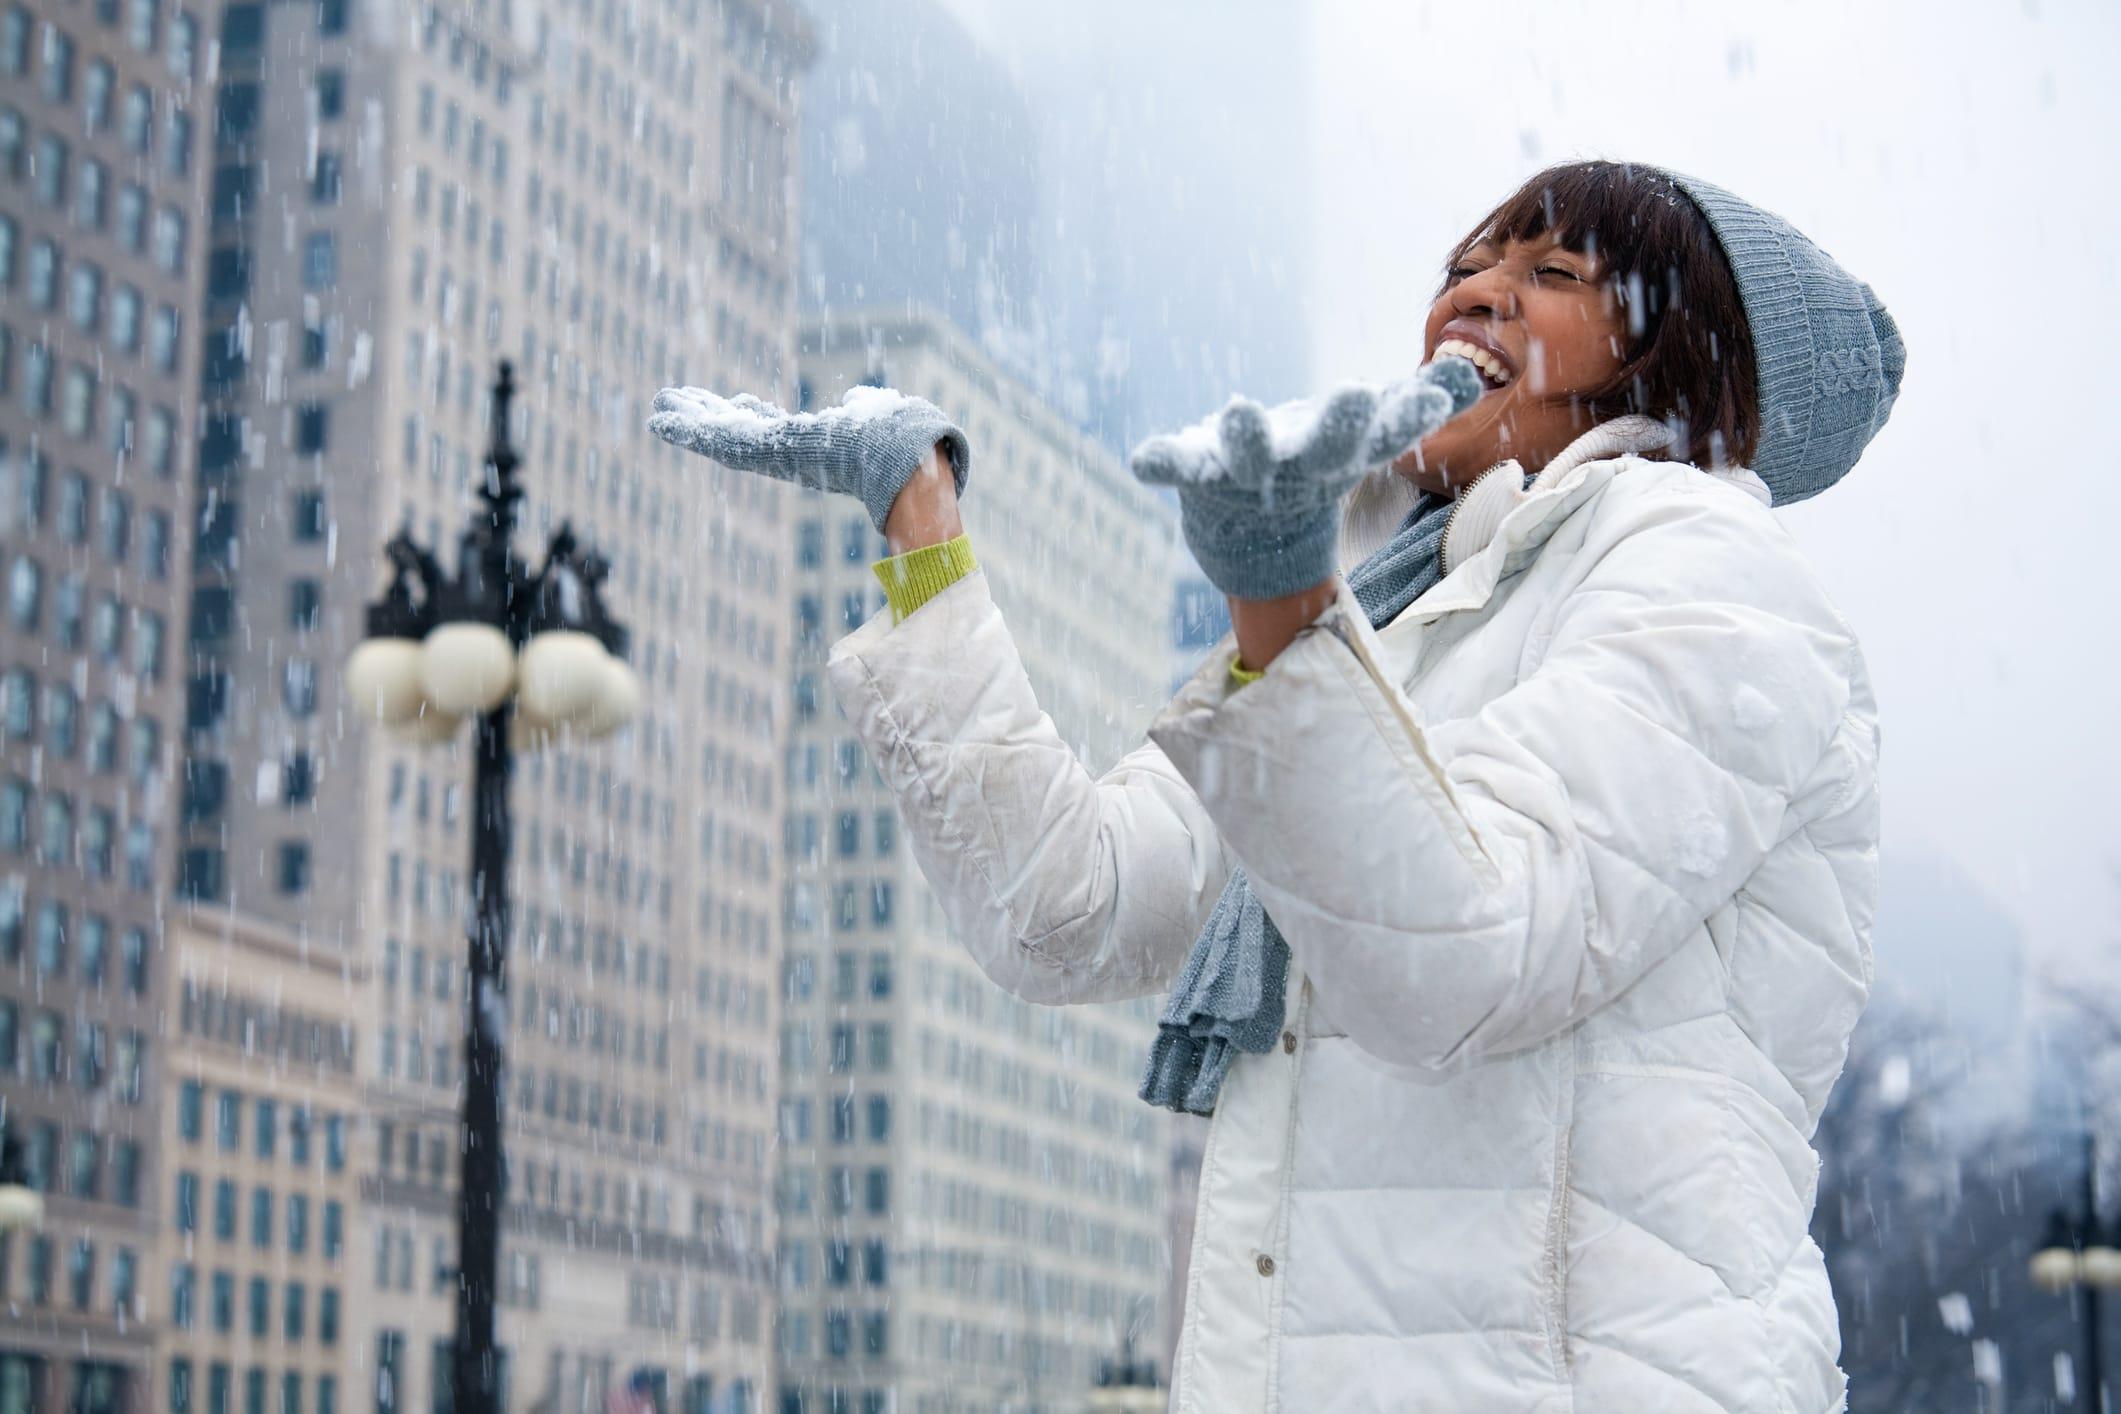 Woman in the City Enjoying Snow